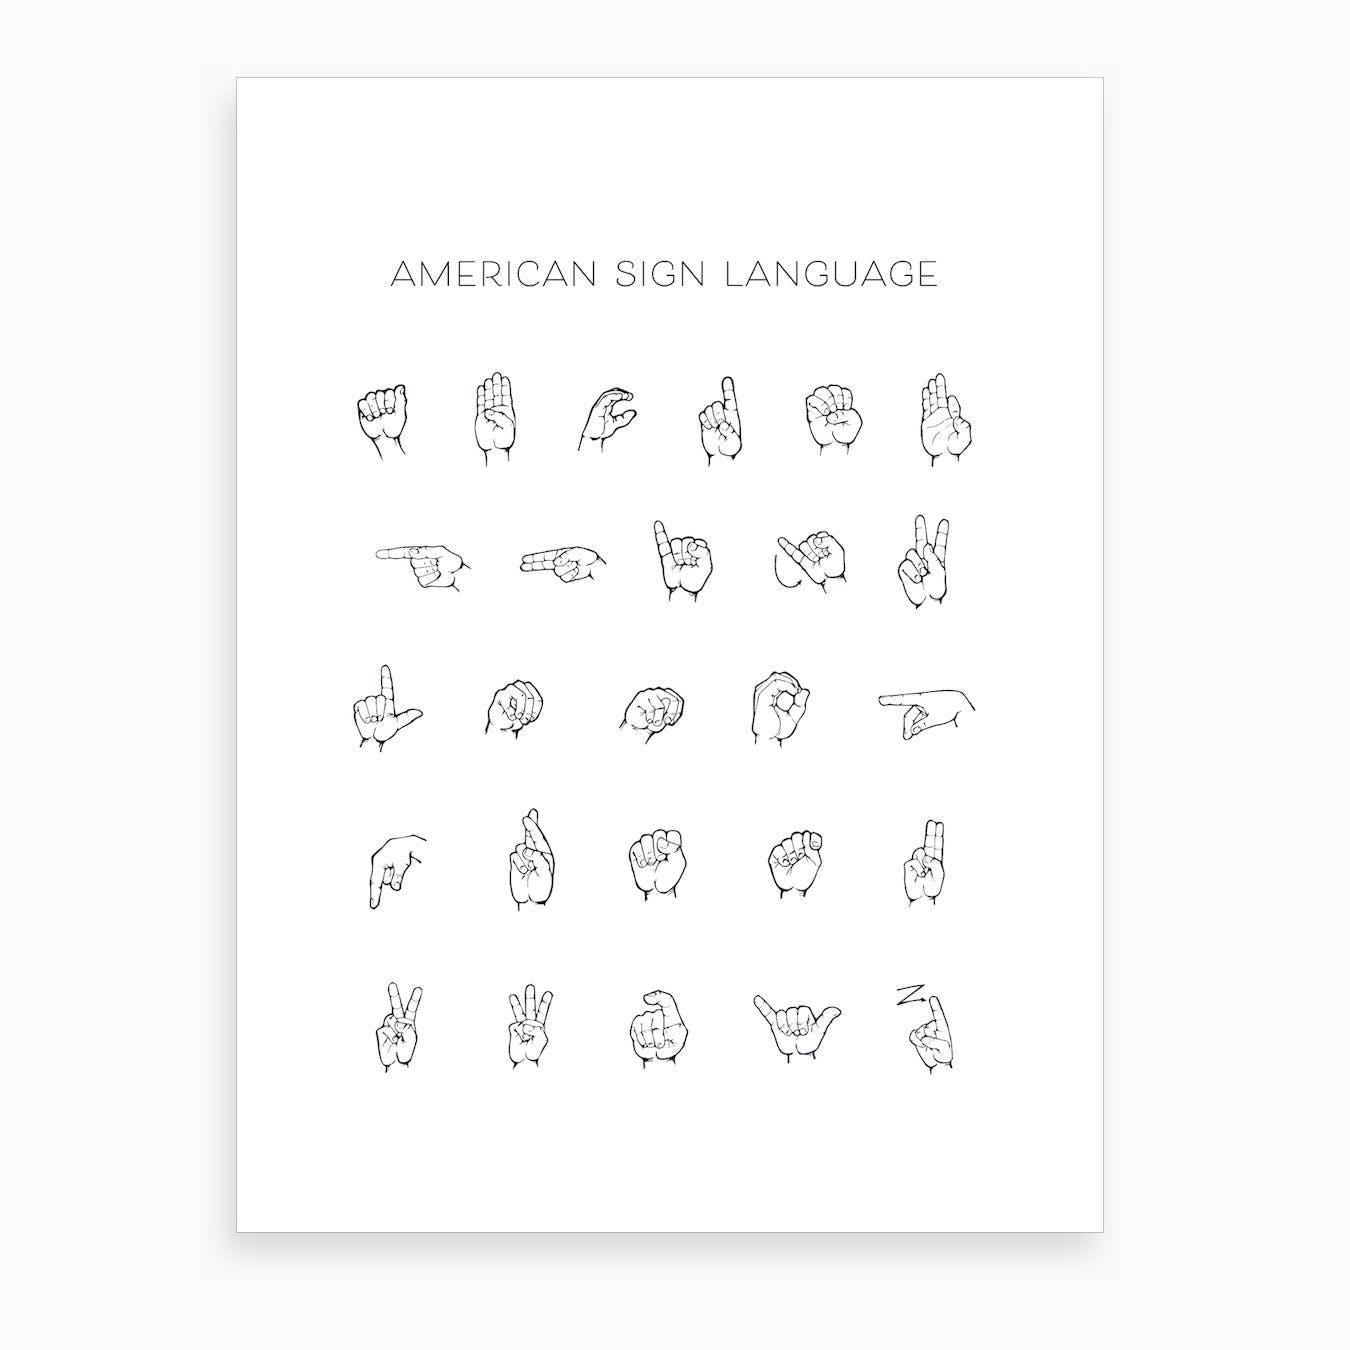 photo regarding Sign Language Chart Printable called American Indicator Language Chart Artwork Print